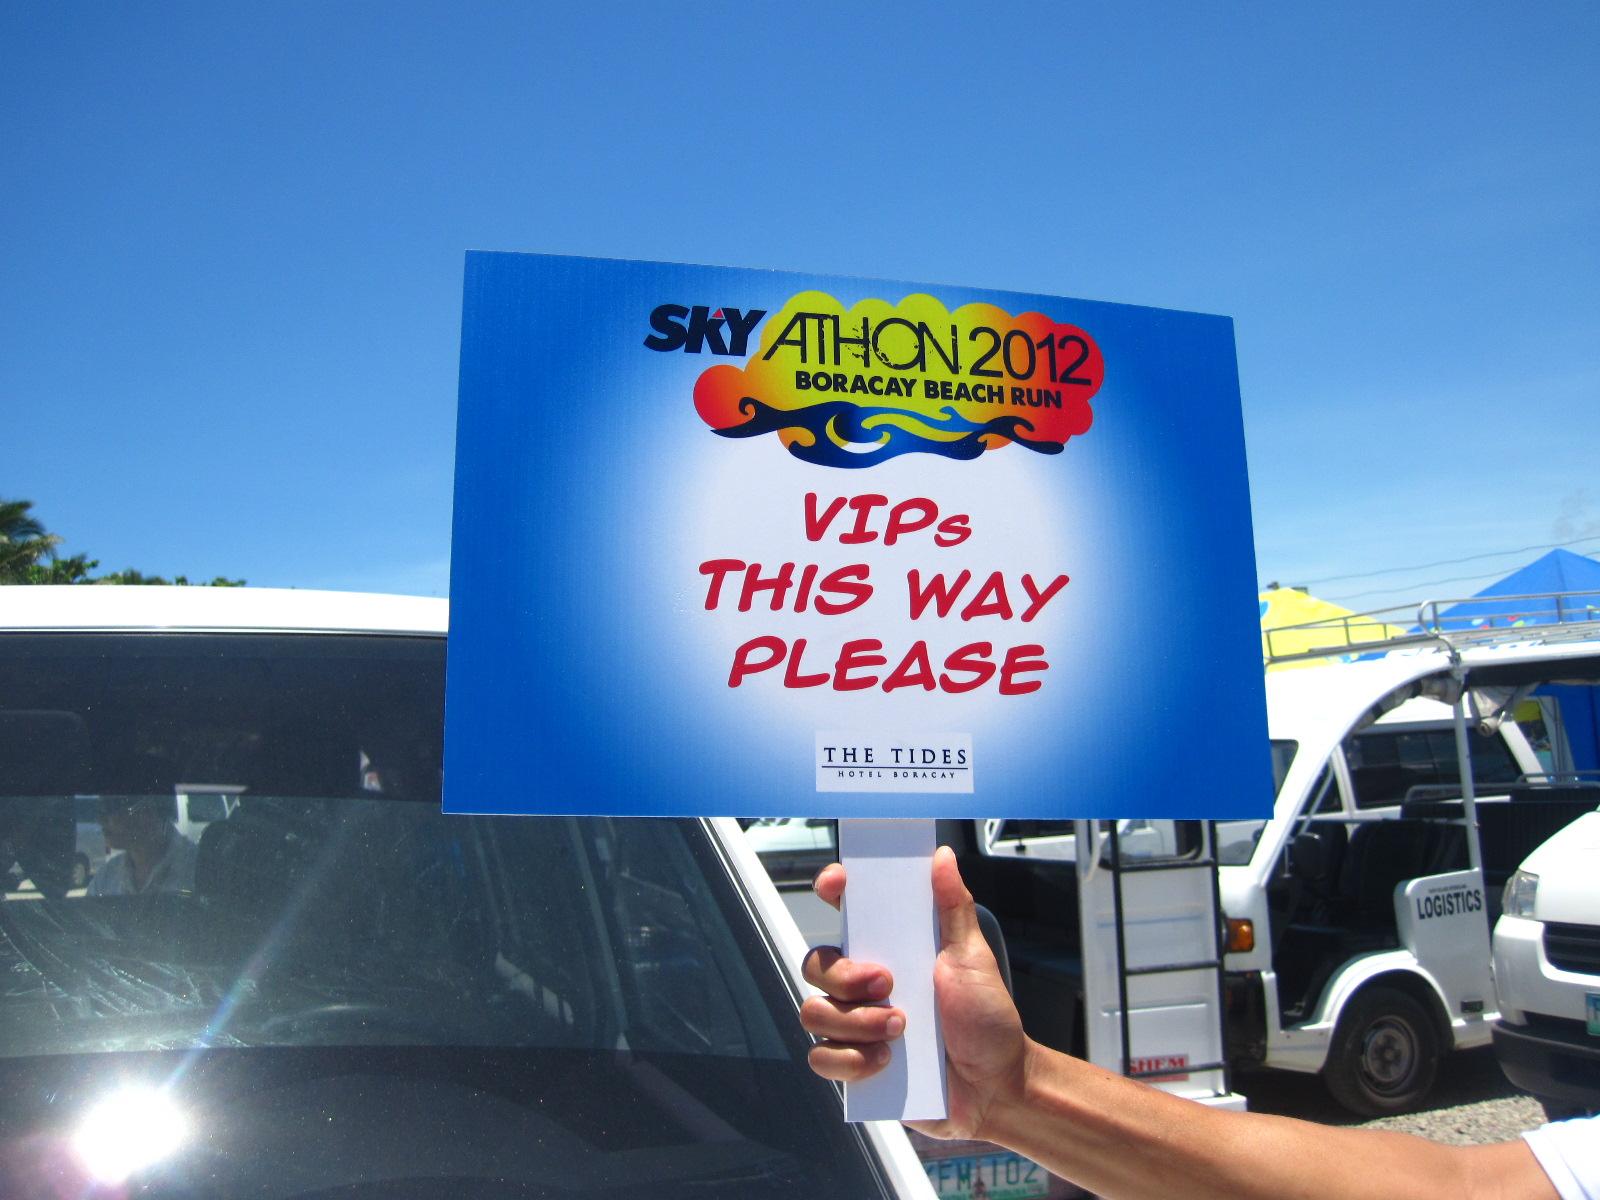 Skyathon 2012: VIP treatment